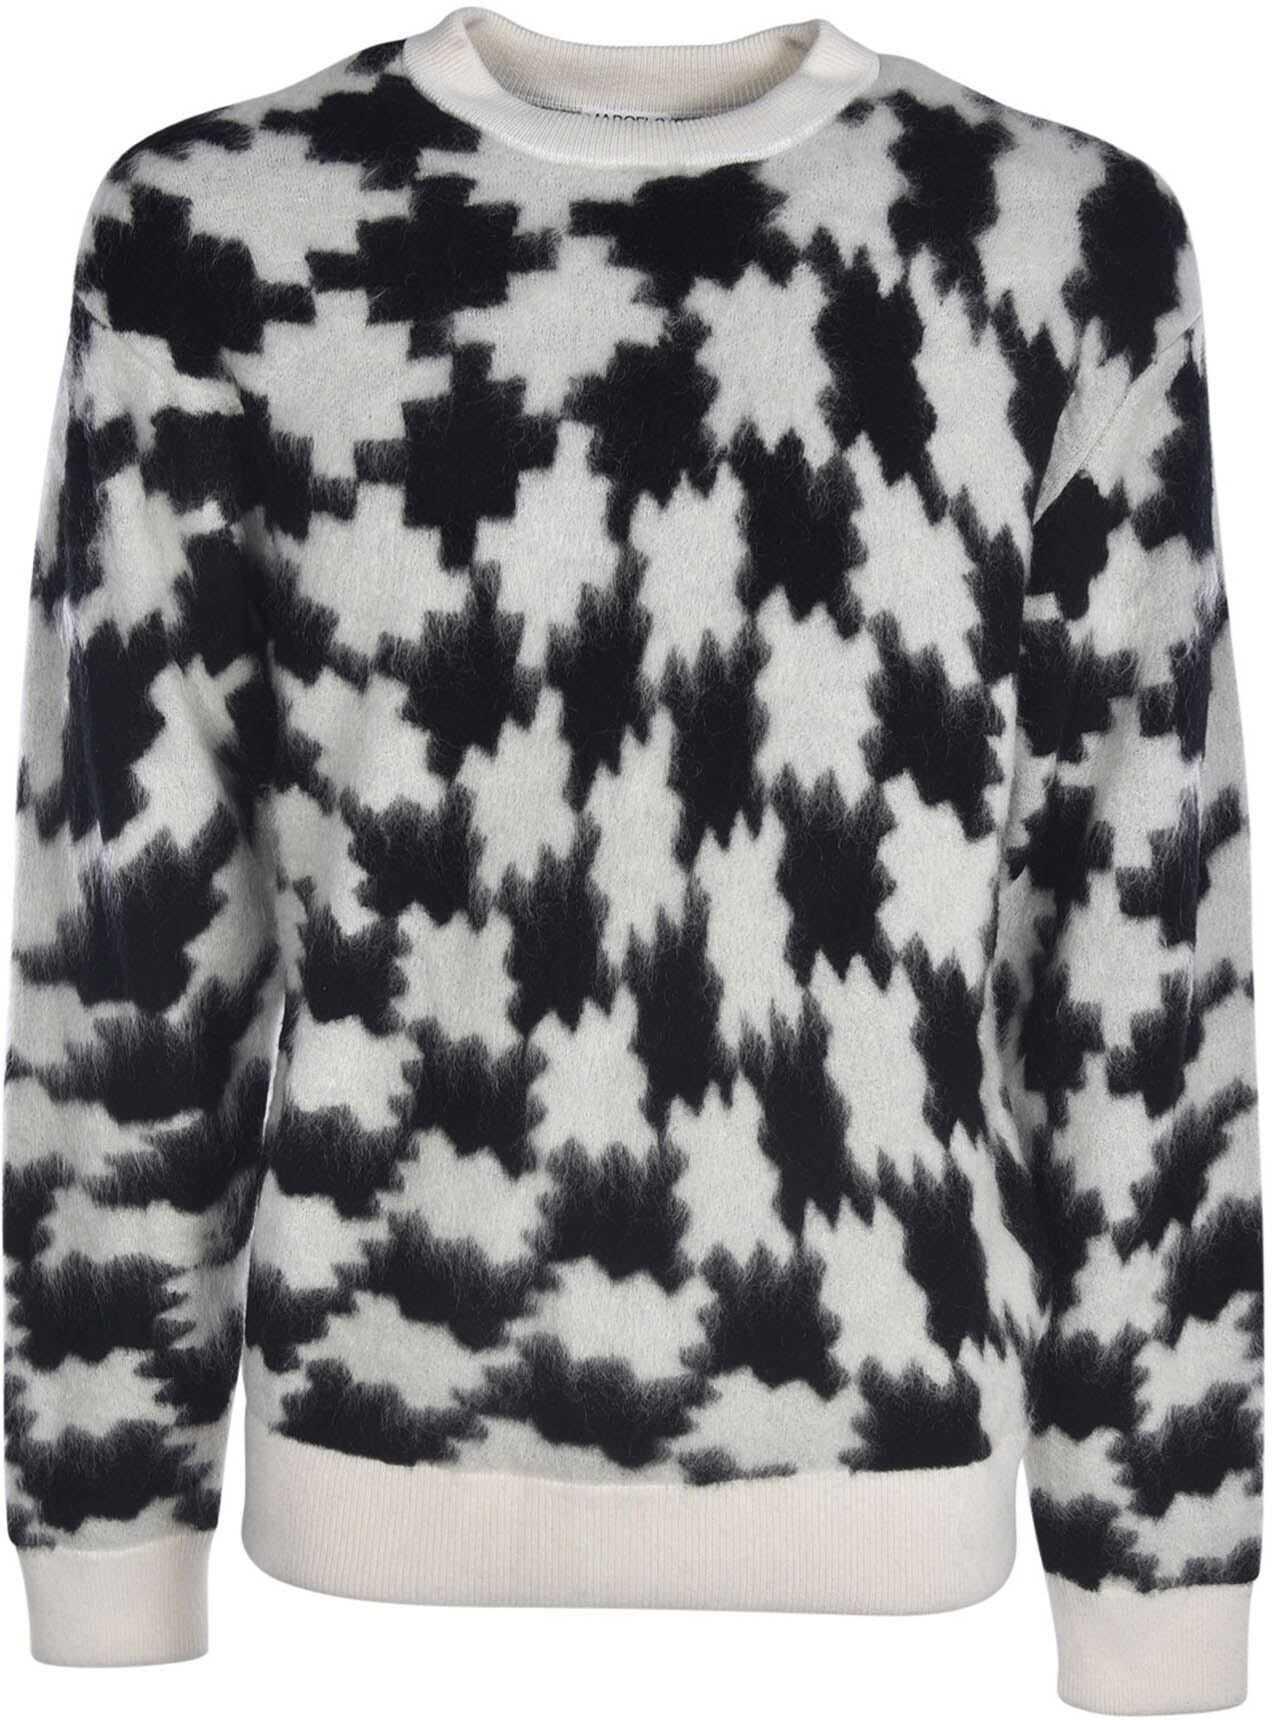 Marcelo Burlon Cross Pdp Sweater In Black And White White imagine